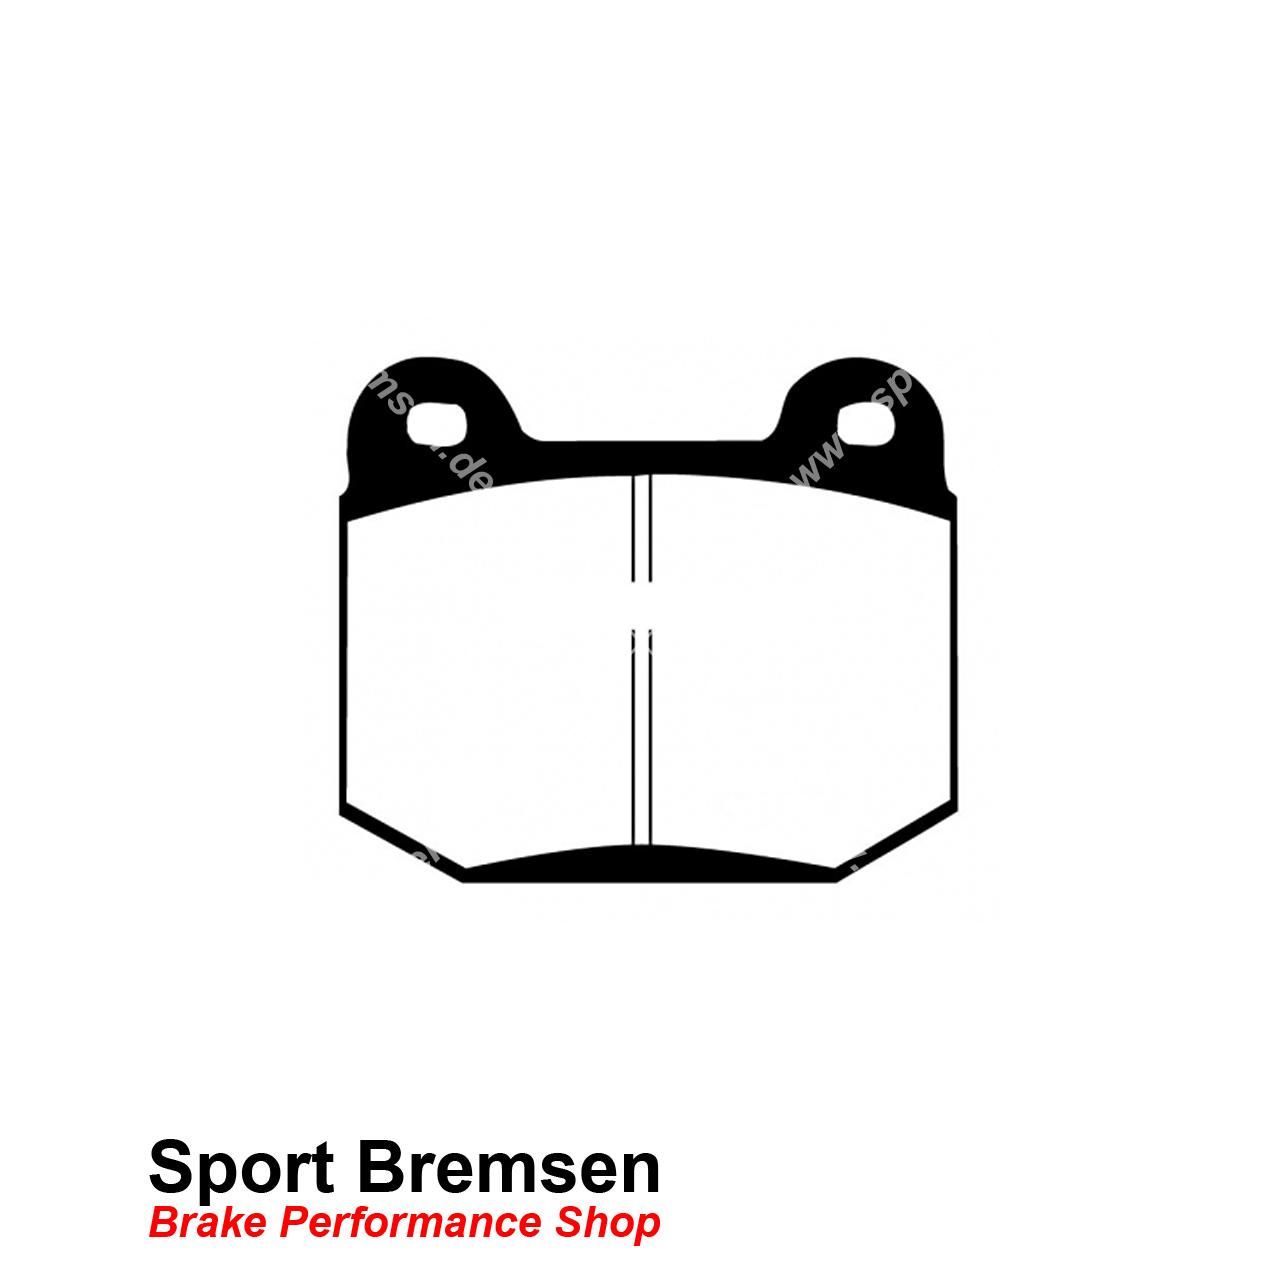 Ebc Redstuff Keramik Bremsbelage Fur Nissan 350z Brembo